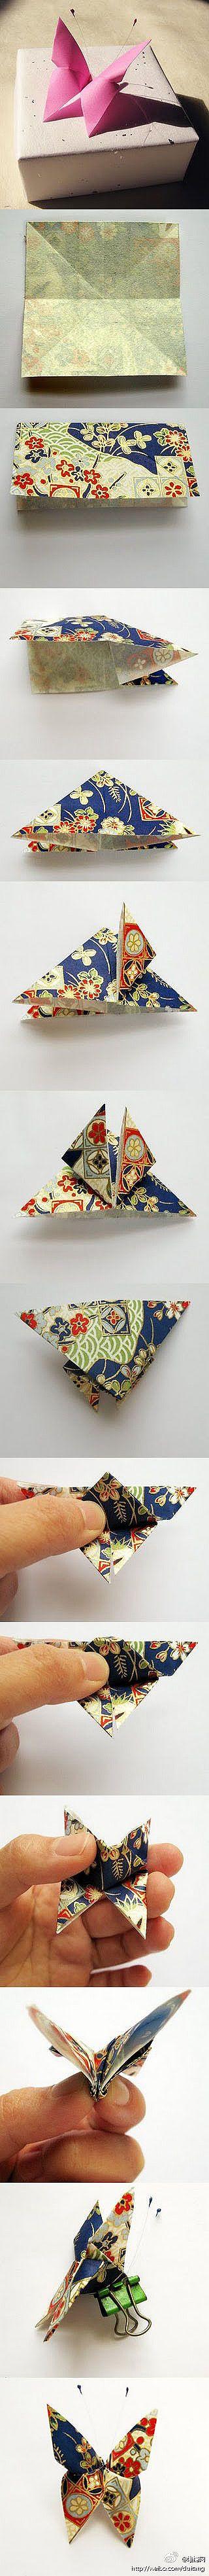 手工DIY    Another butterfly tutorial